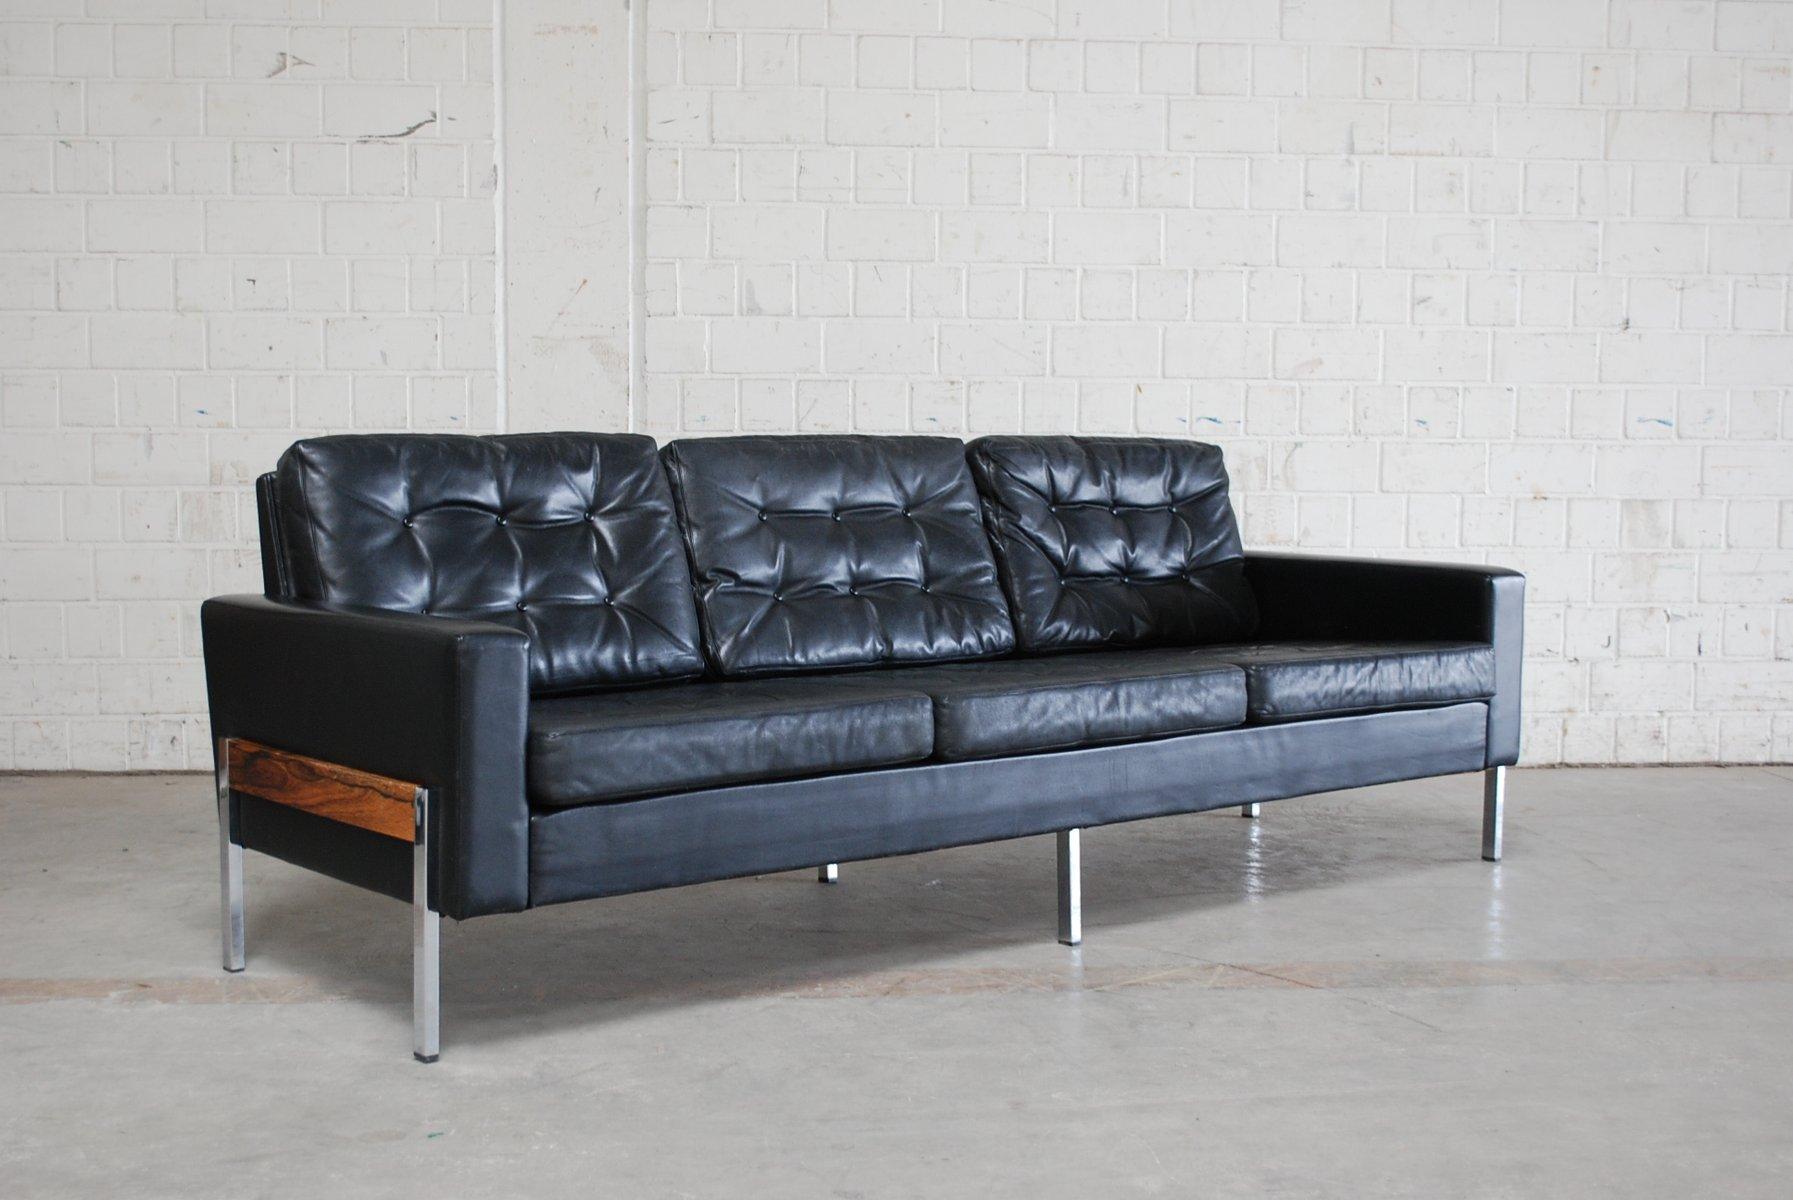 German sofa bed wilhelm knoll teak sectional sleeper sofa for Sofa bed germany